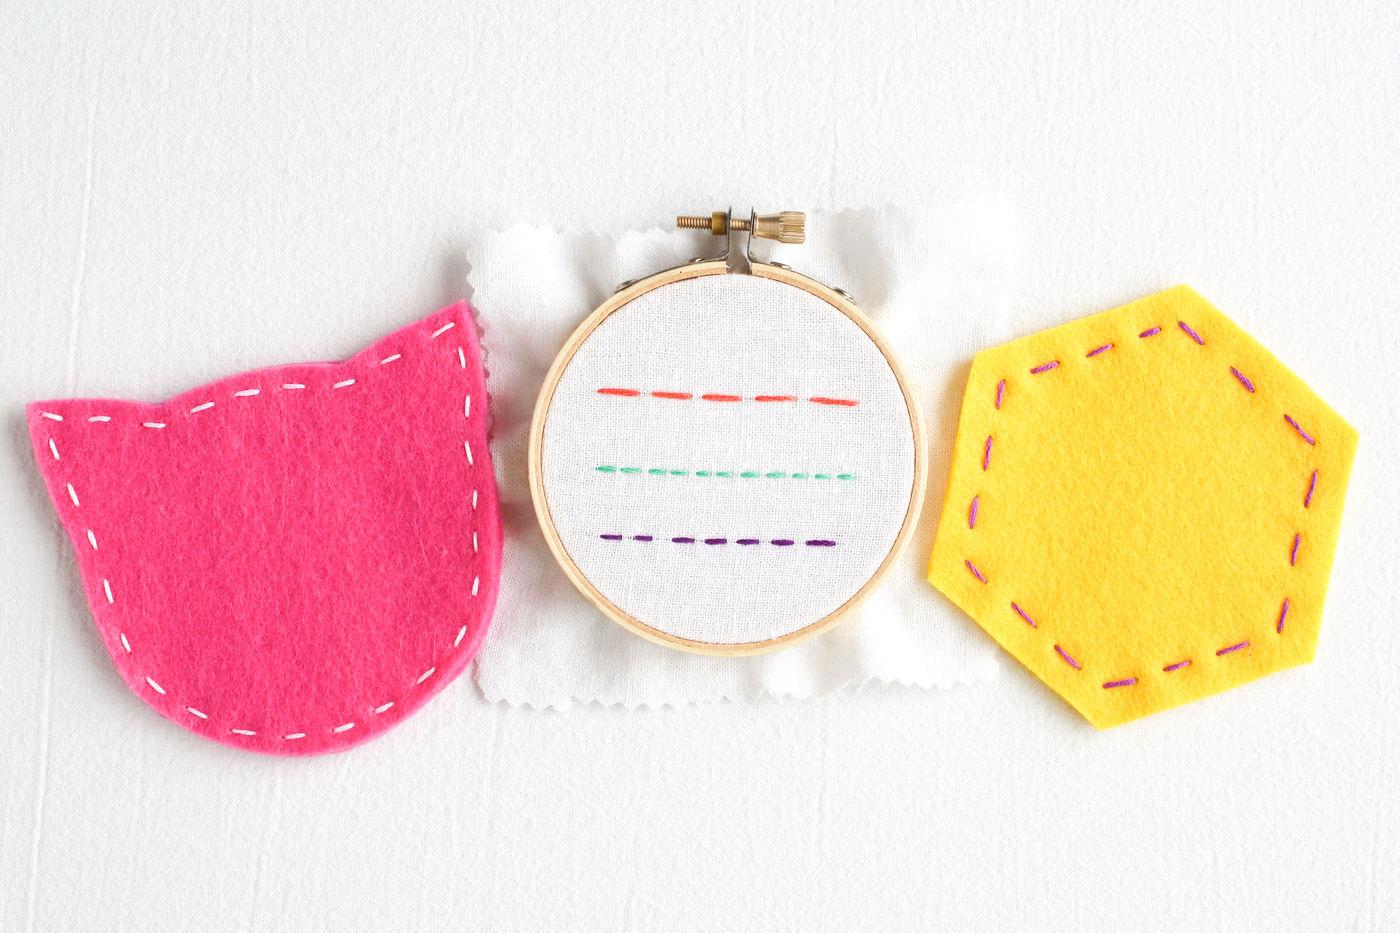 Sewing Running Stitch Coasters